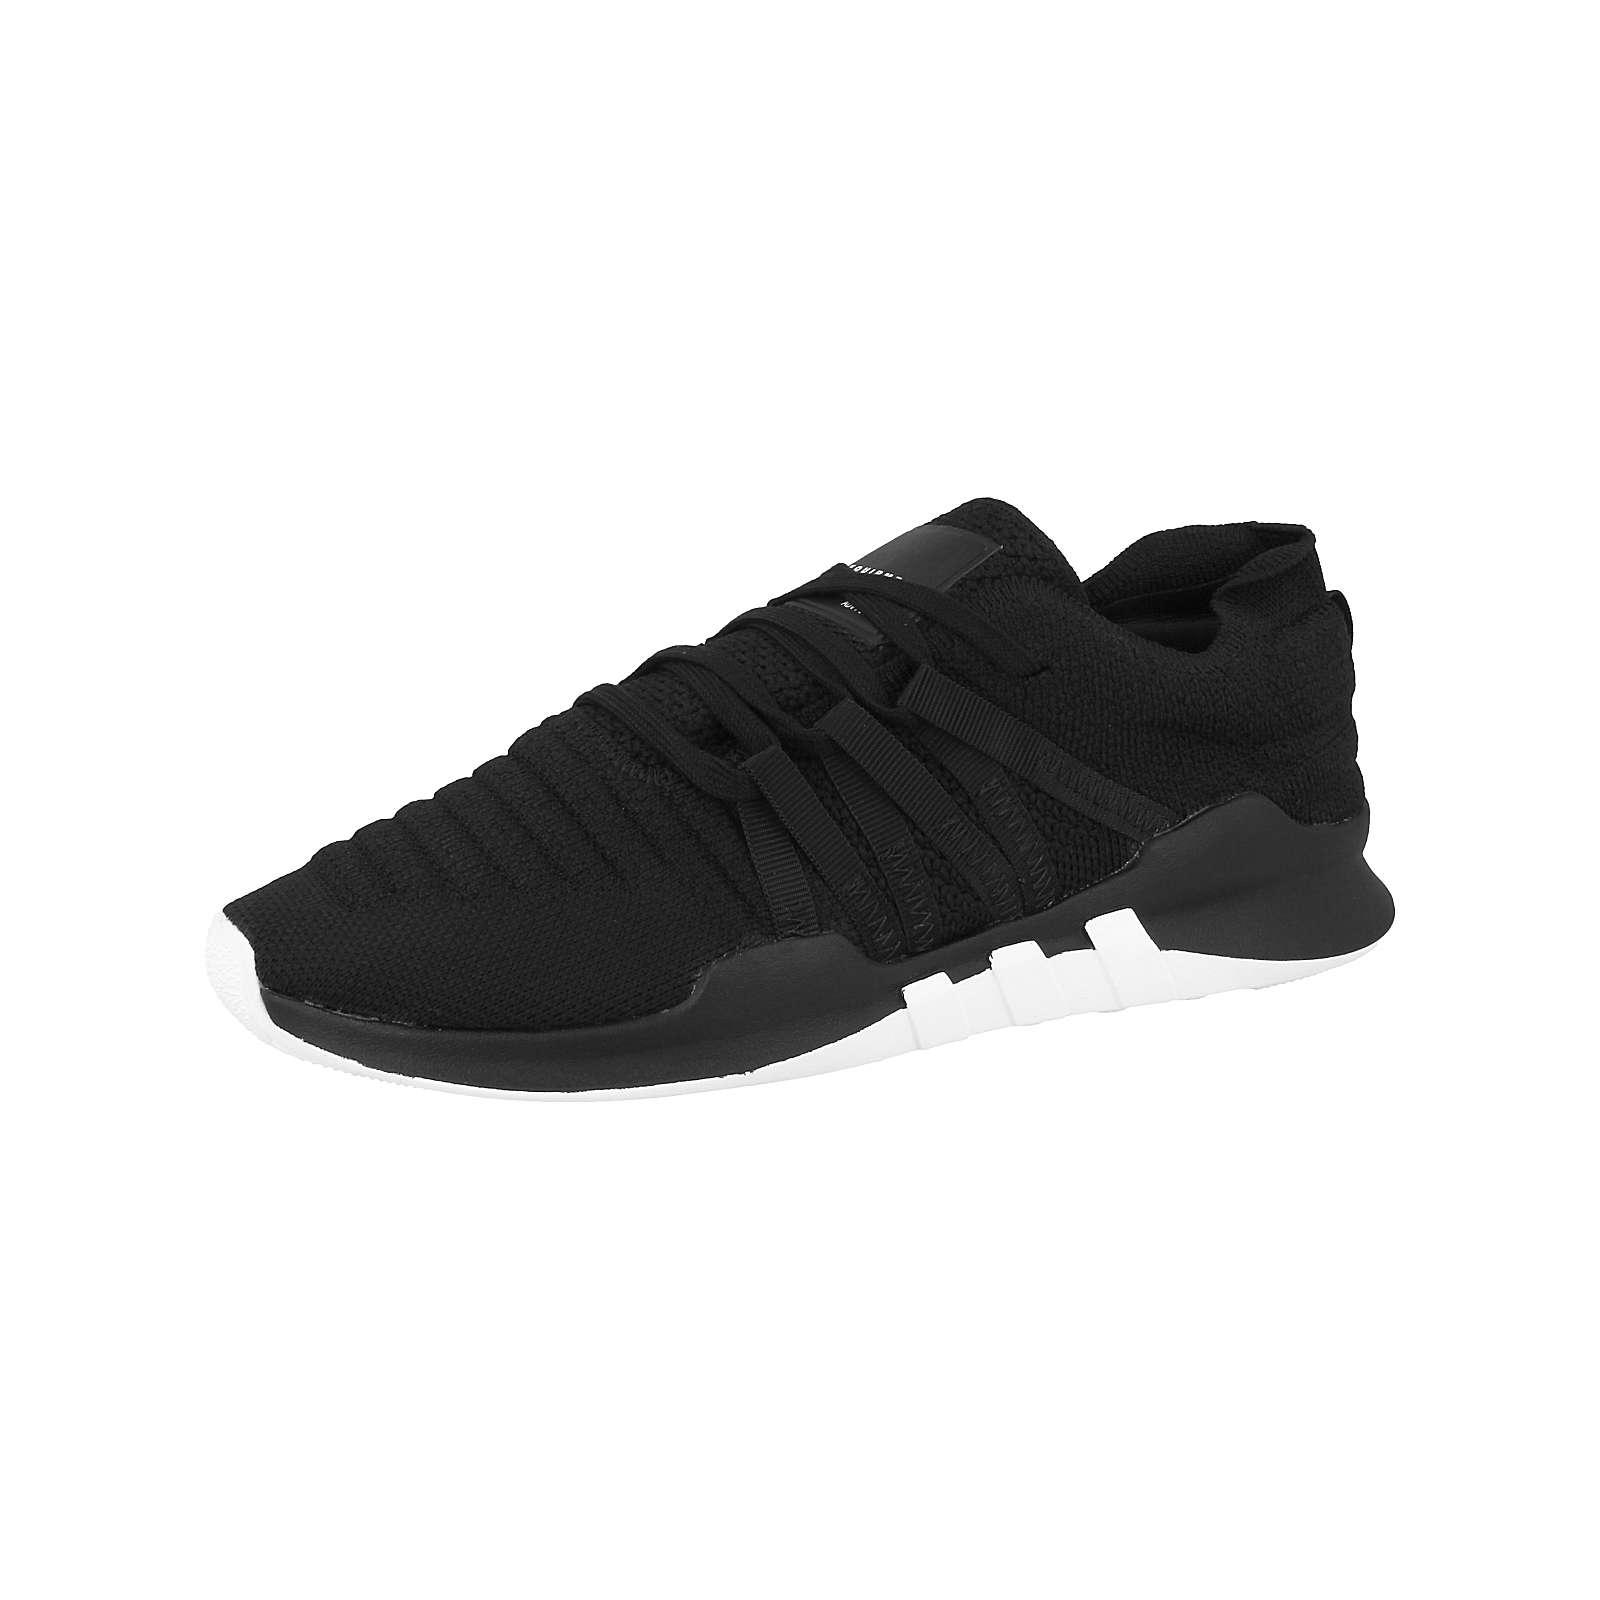 adidas Originals EQT Racing ADV PK Sneakers Low schwarz Damen Gr. 38